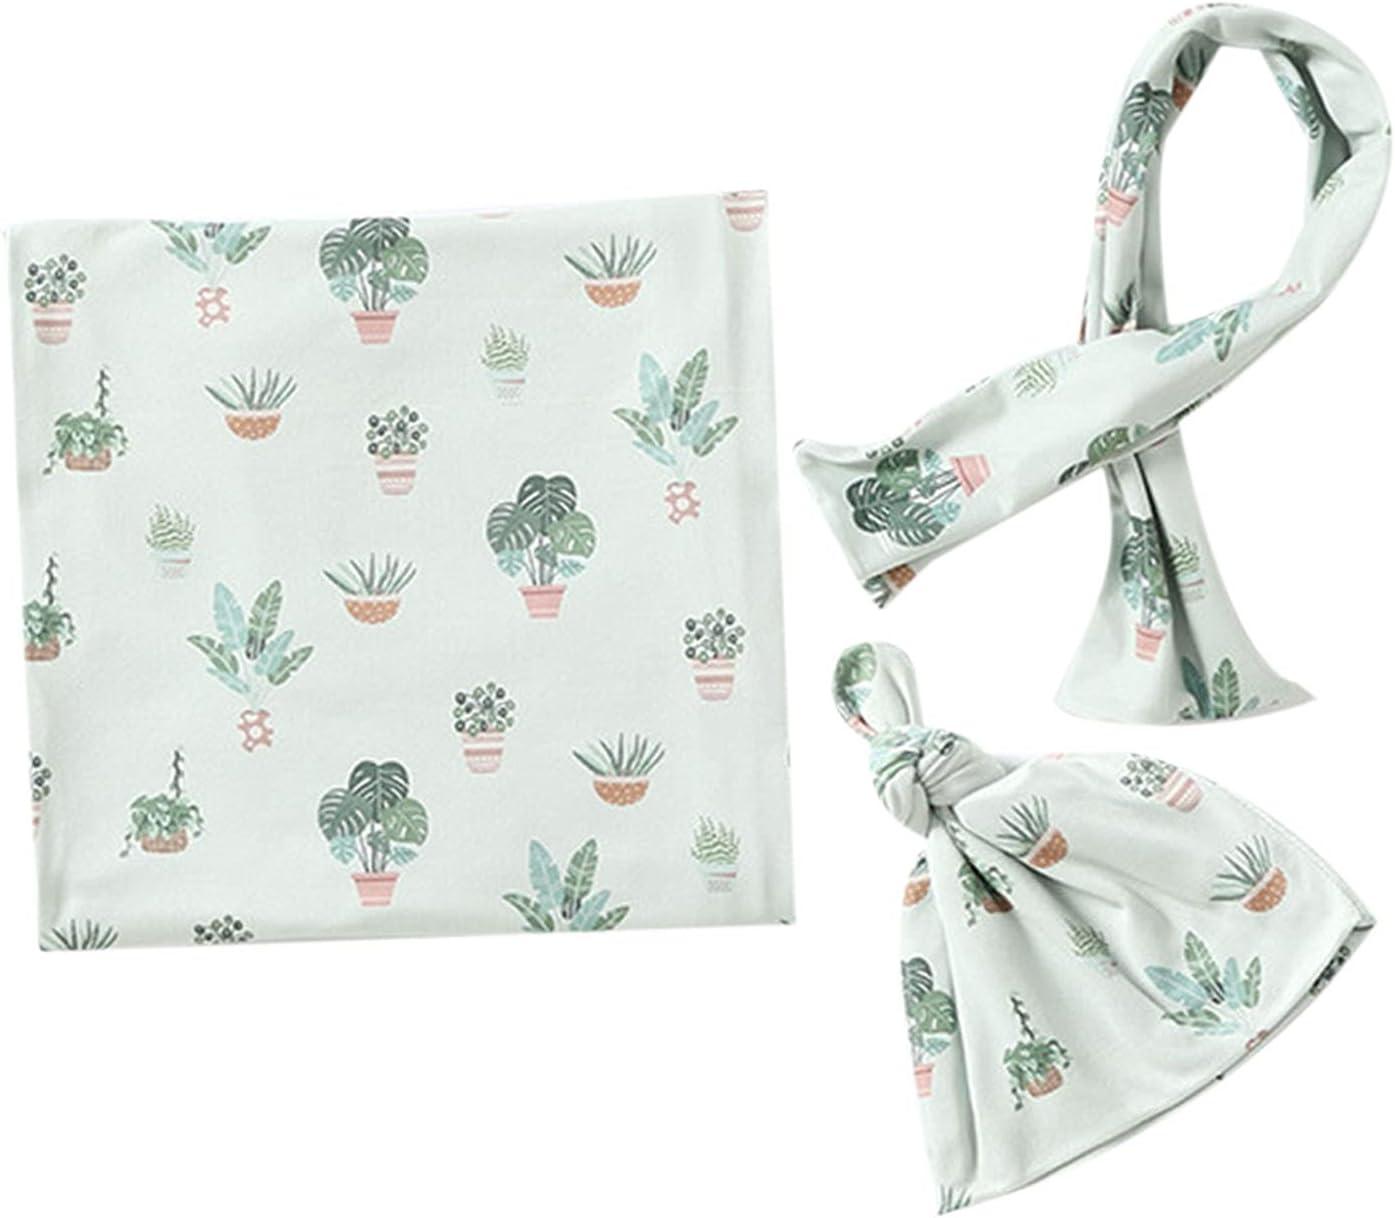 ROSEBEAR 3pcs Baby Swaddle Free shipping / New Blanket Newborn ...